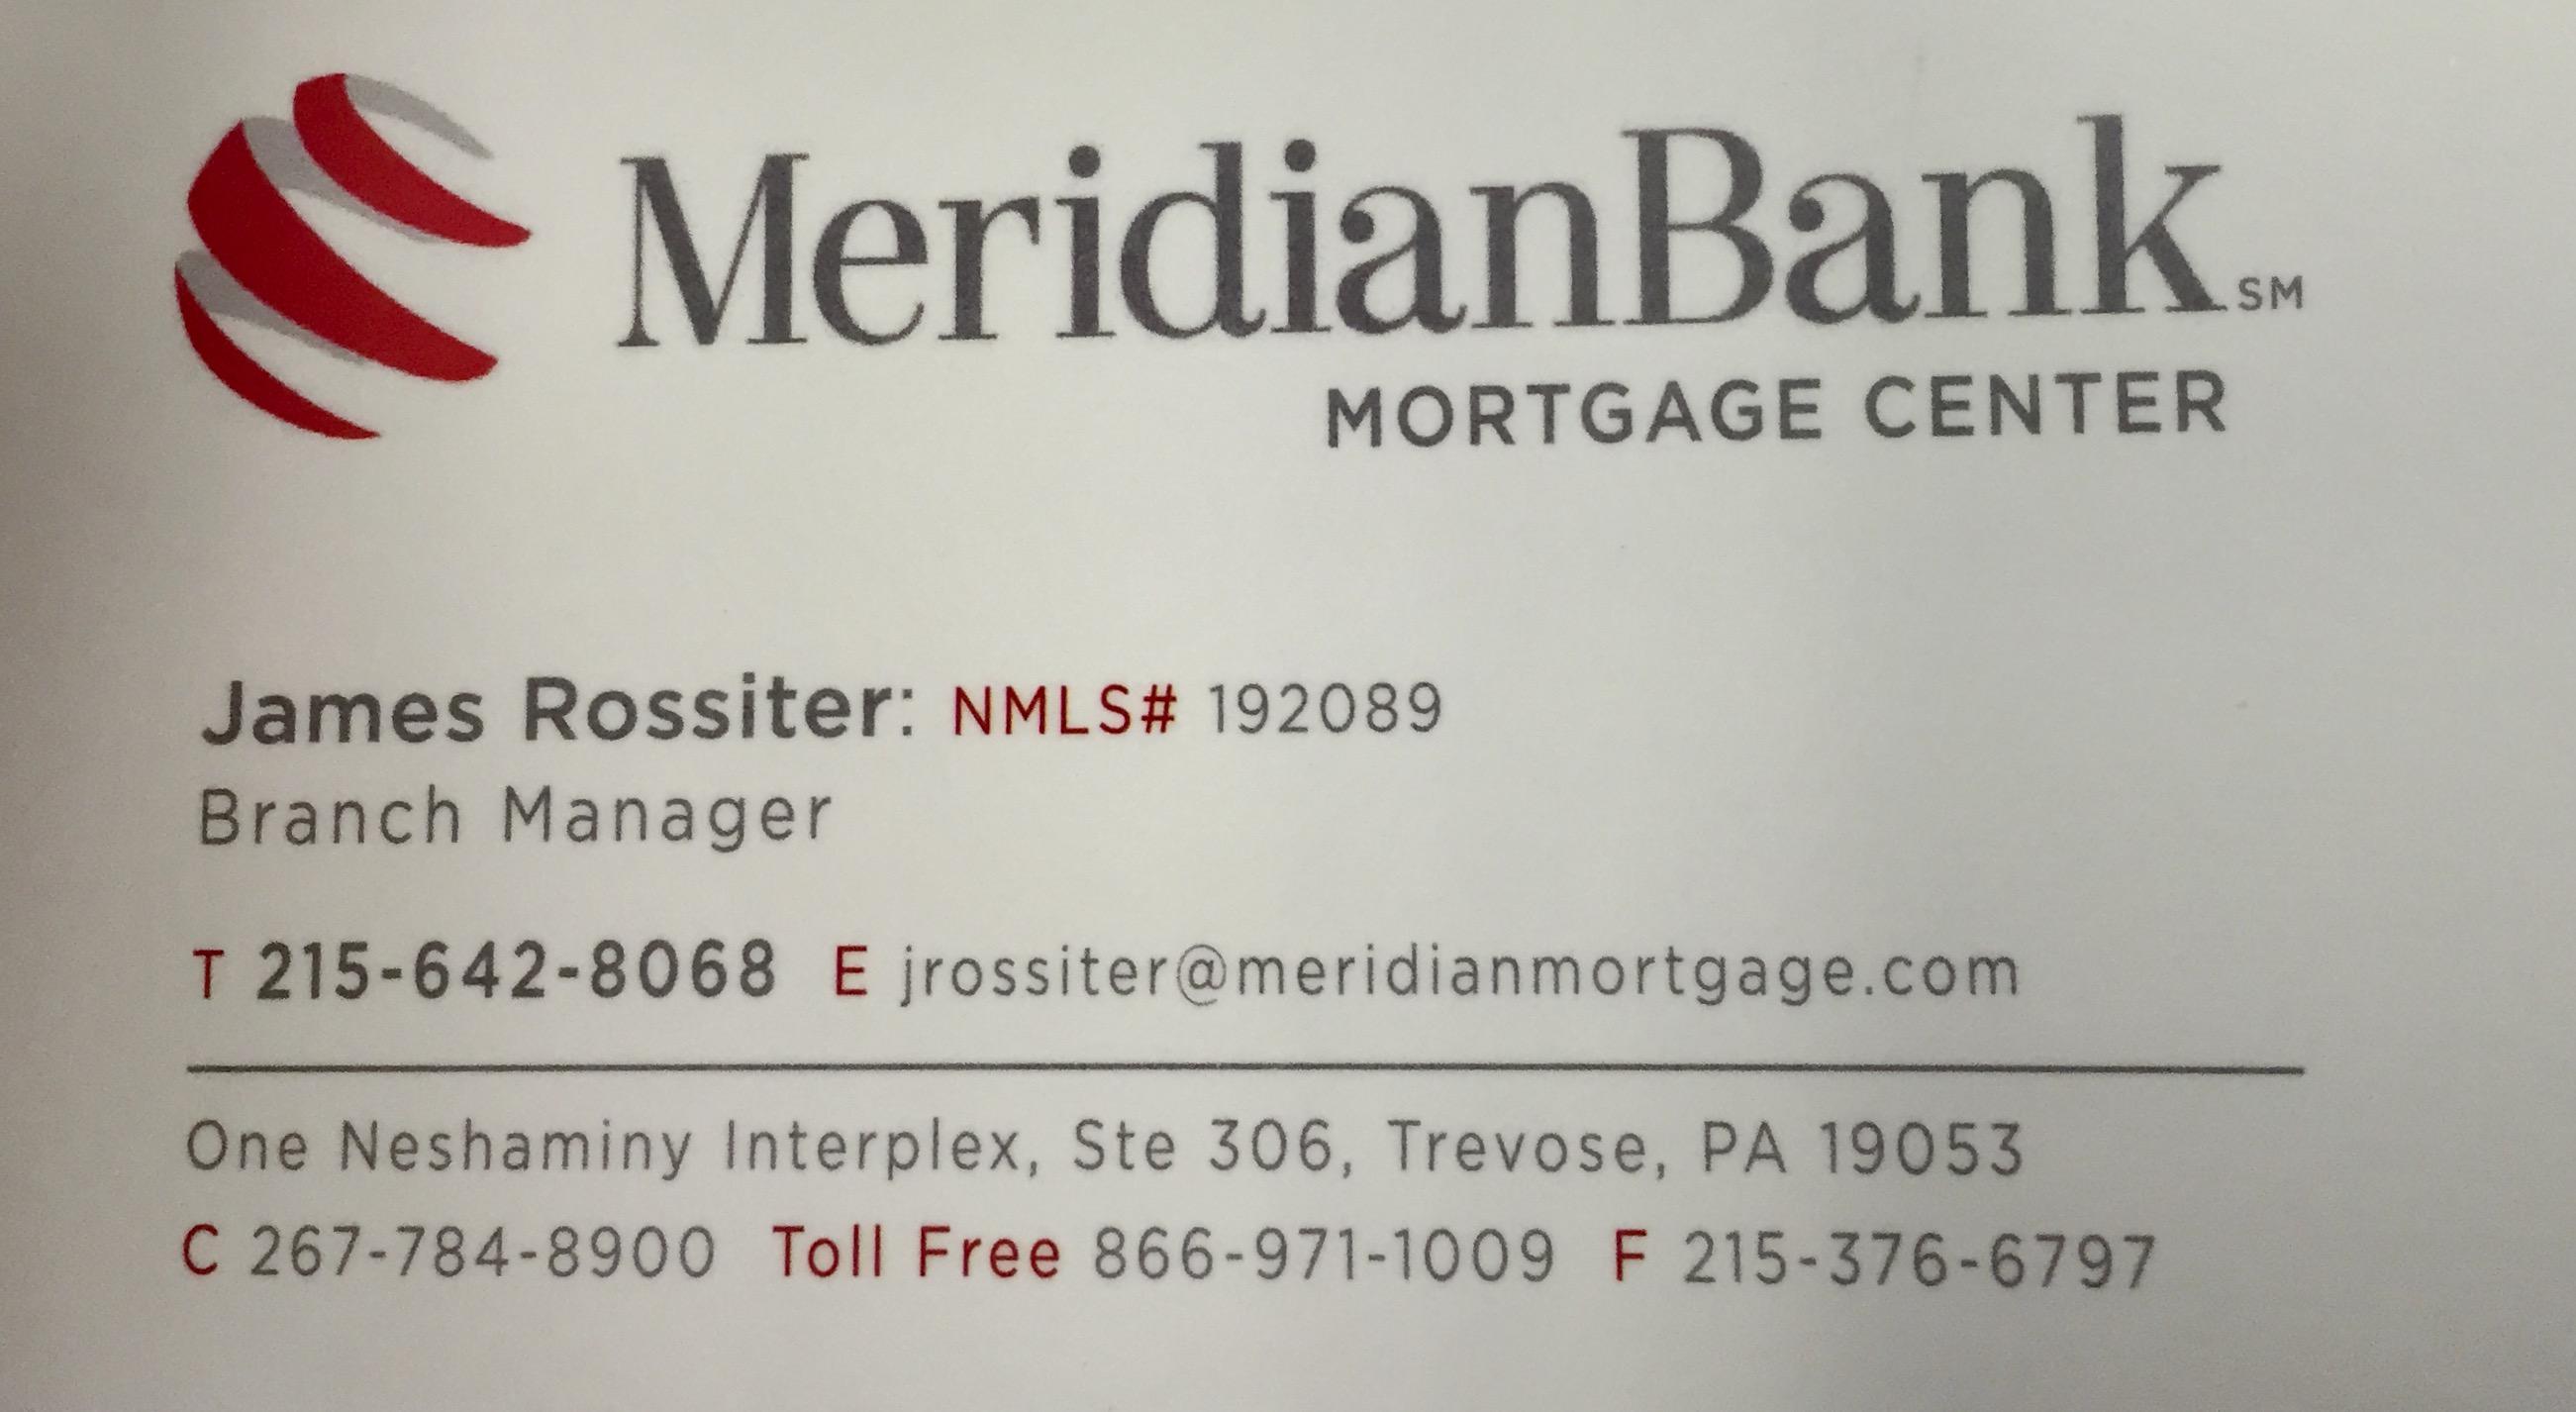 MeridianBank